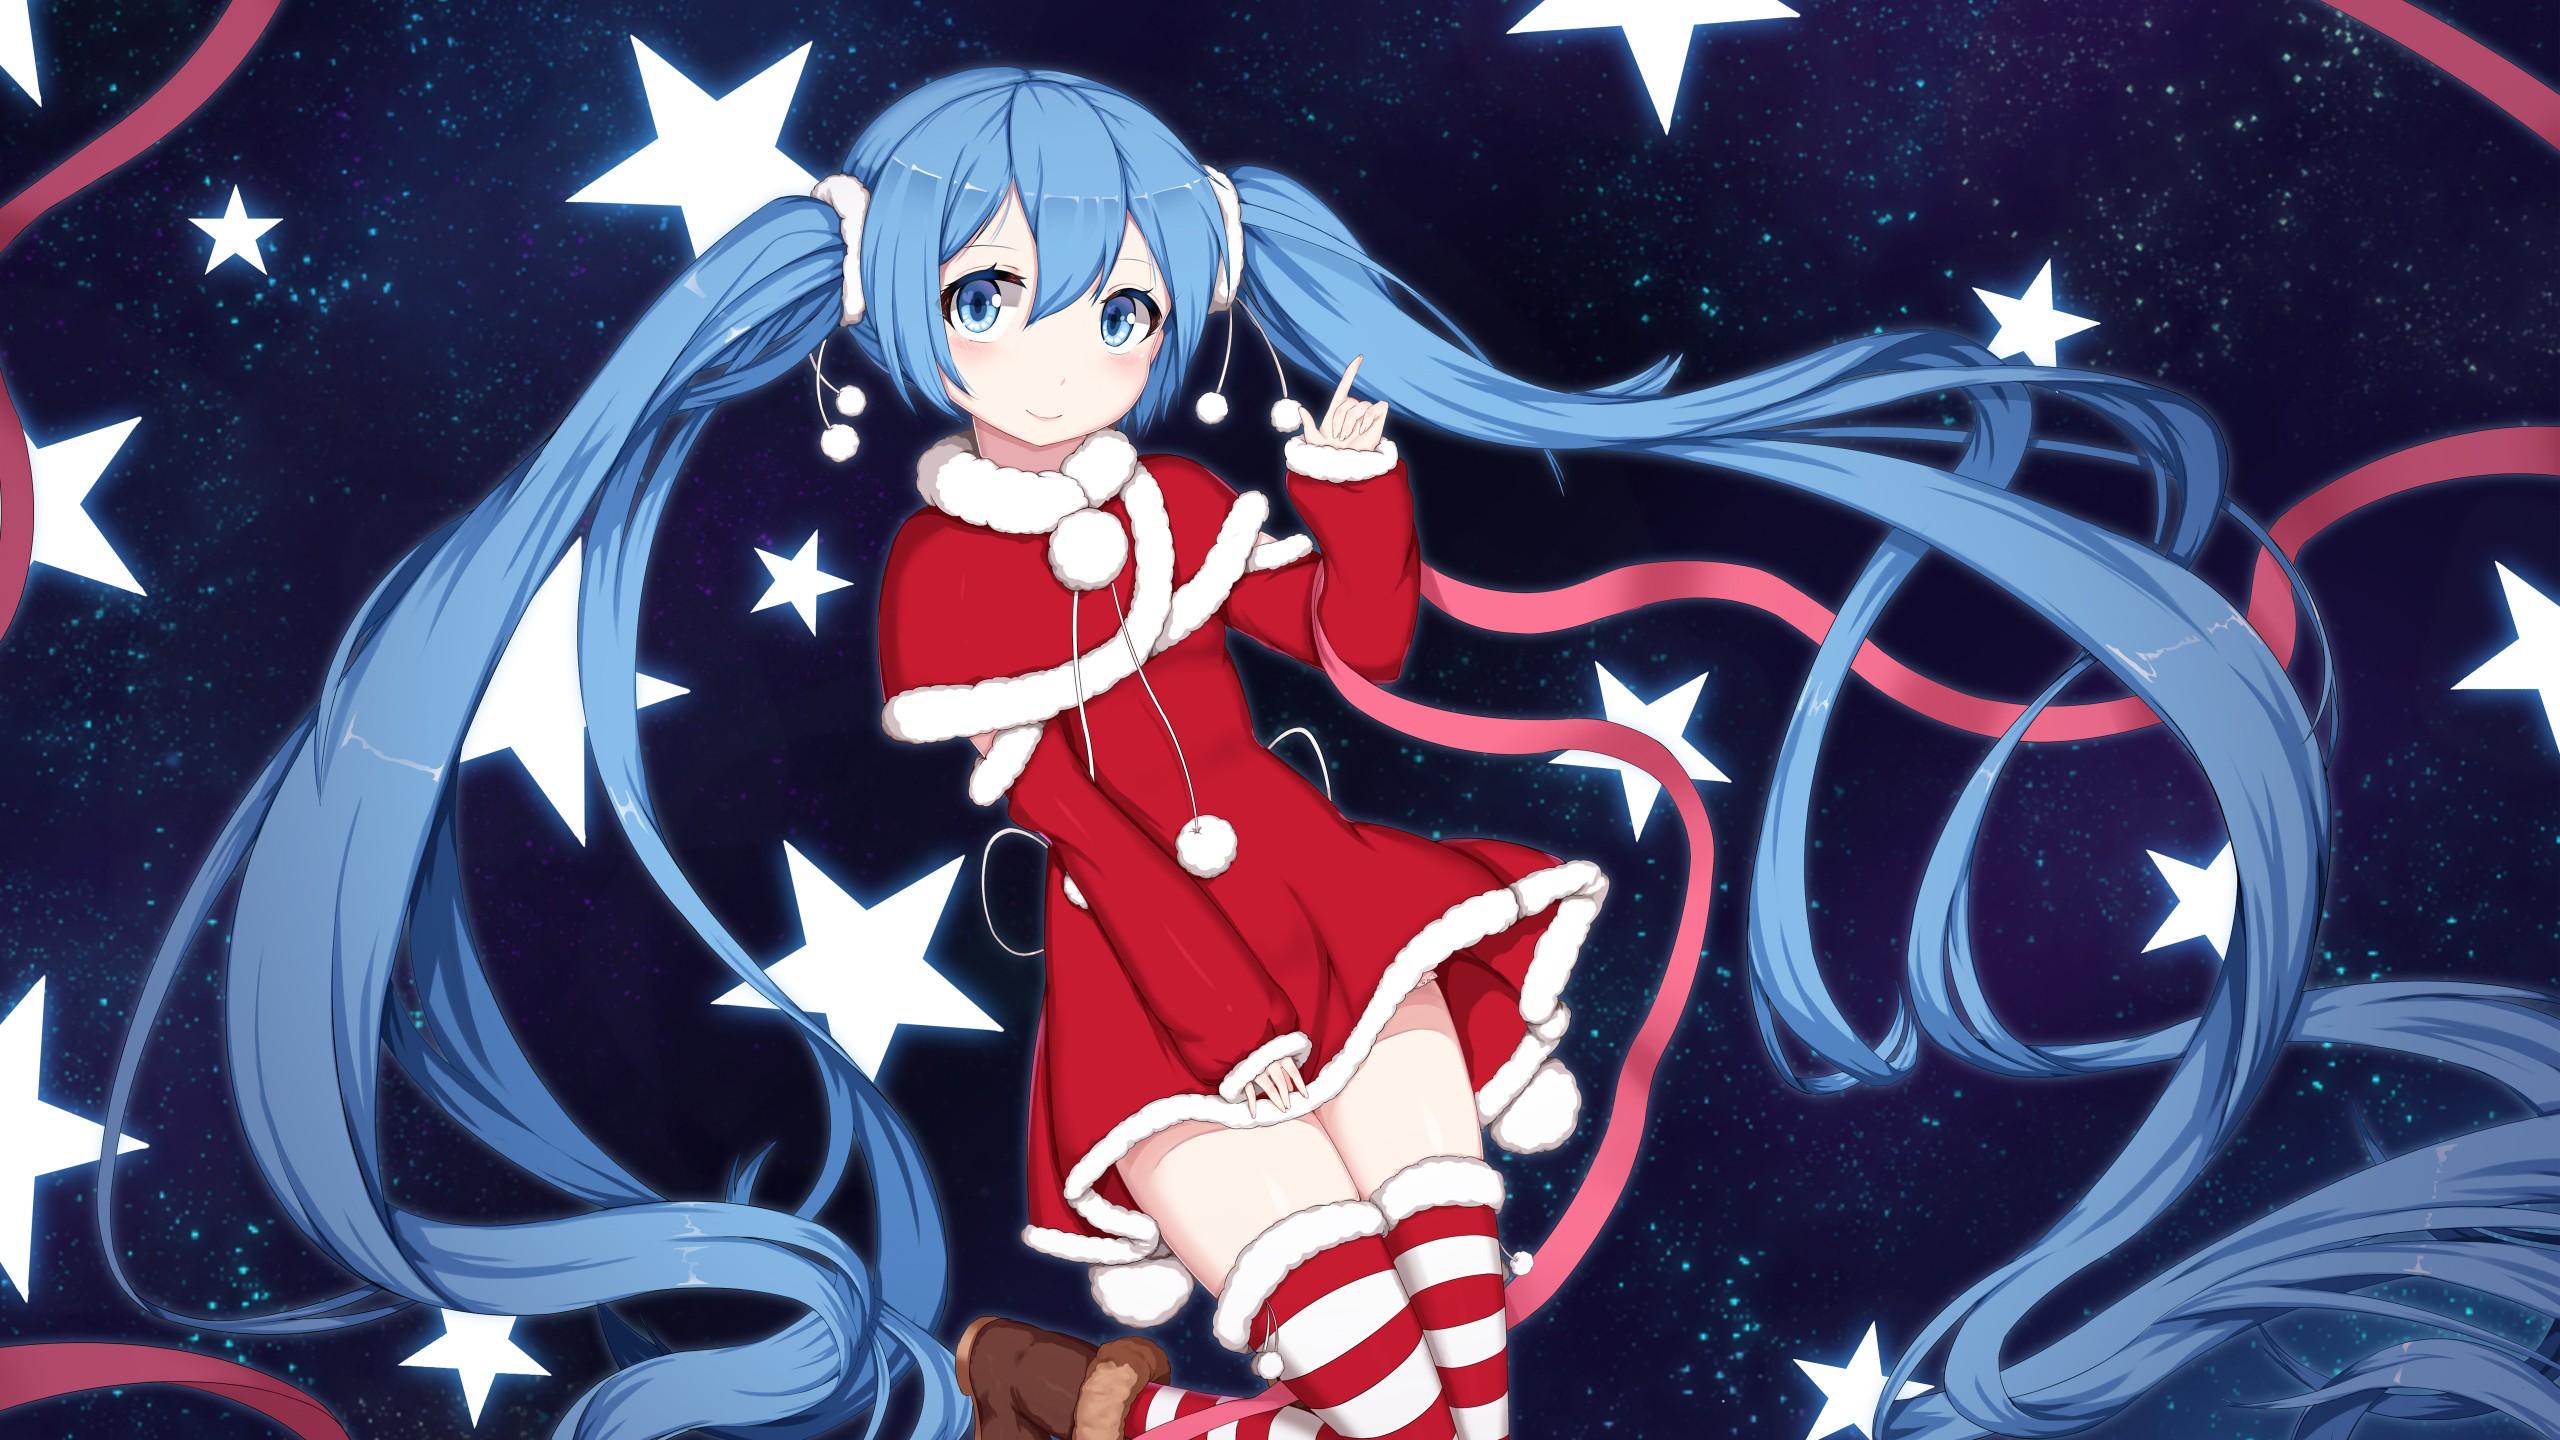 Miku Iphone Wallpaper Vocaloid Hatsune Miku Santa Wallpapers Hd Wallpapers